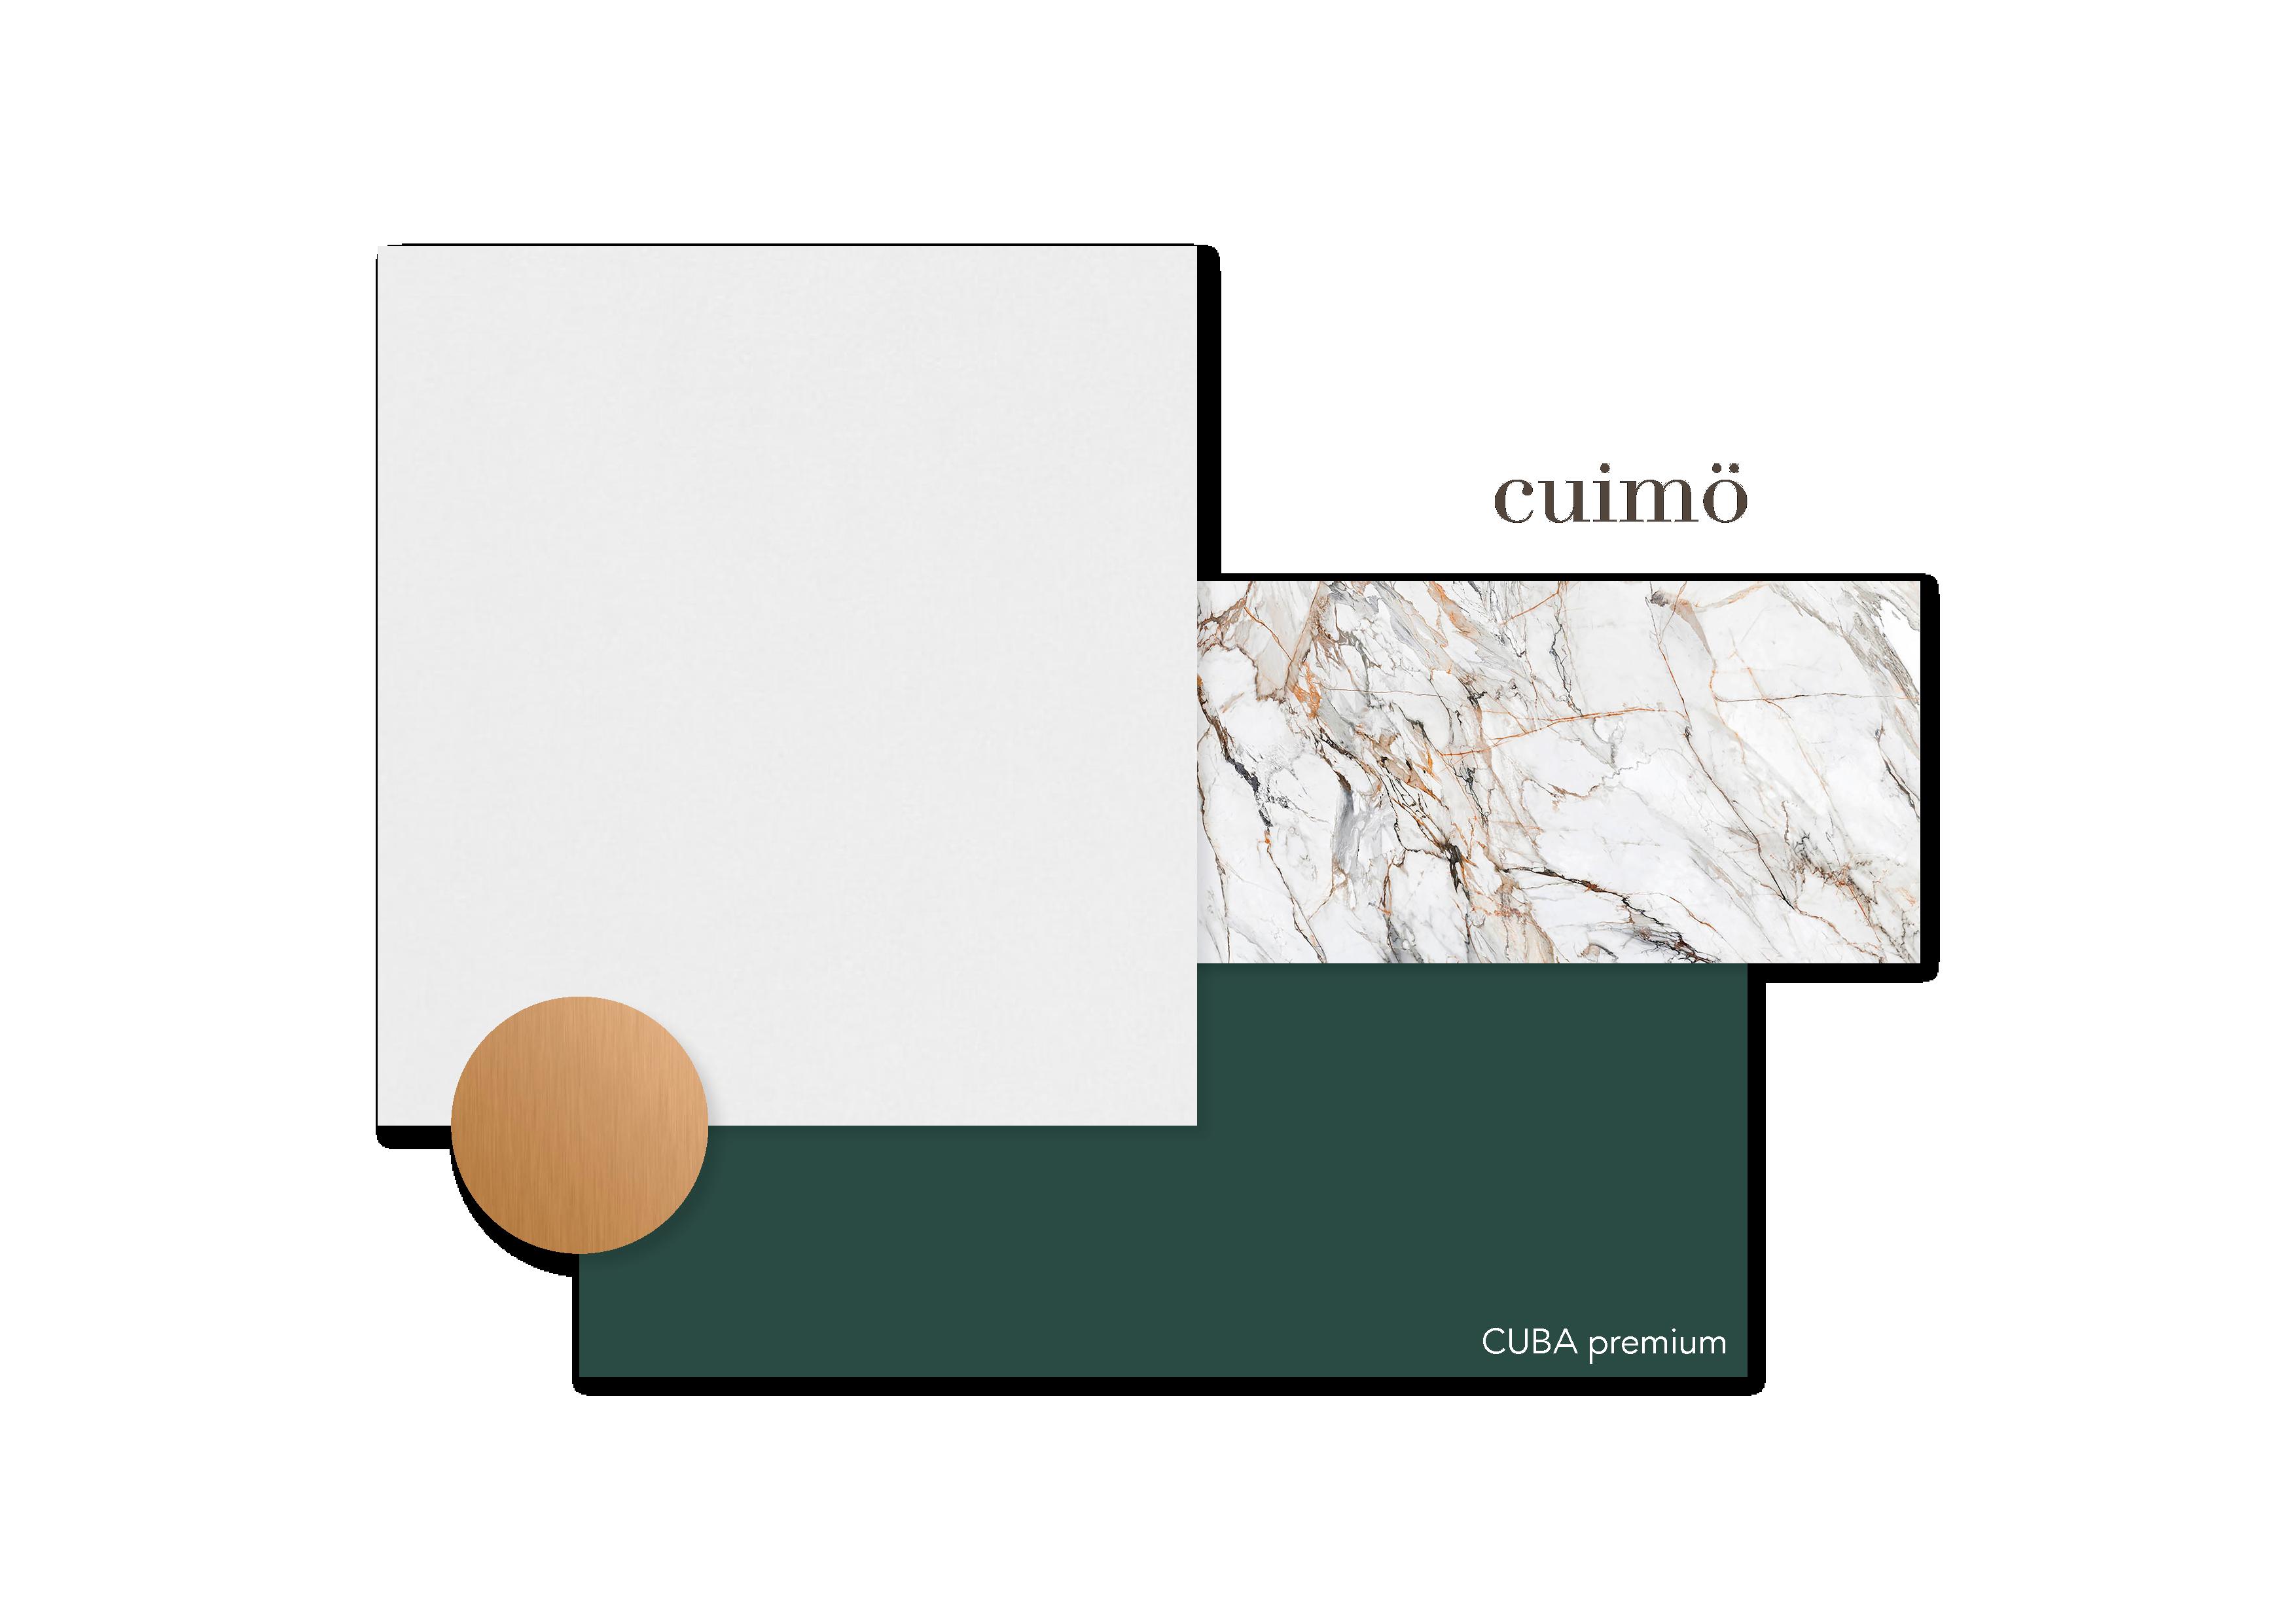 CUIMO_combi30